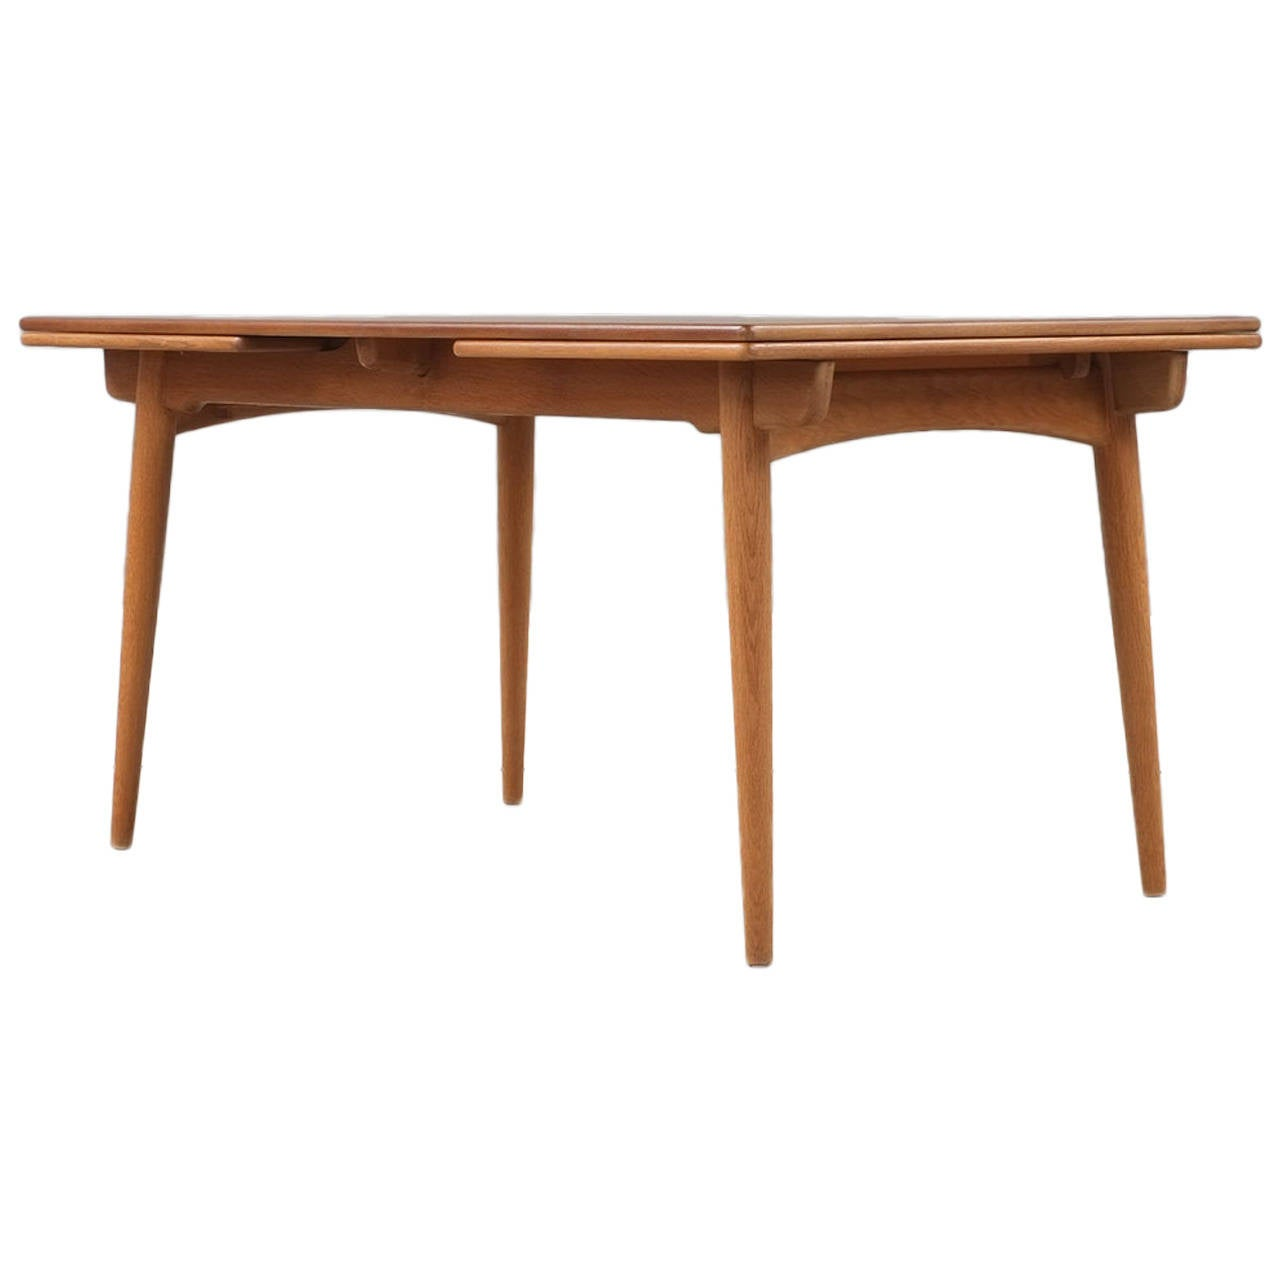 hans wegner at312 dining table at 1stdibs. Black Bedroom Furniture Sets. Home Design Ideas